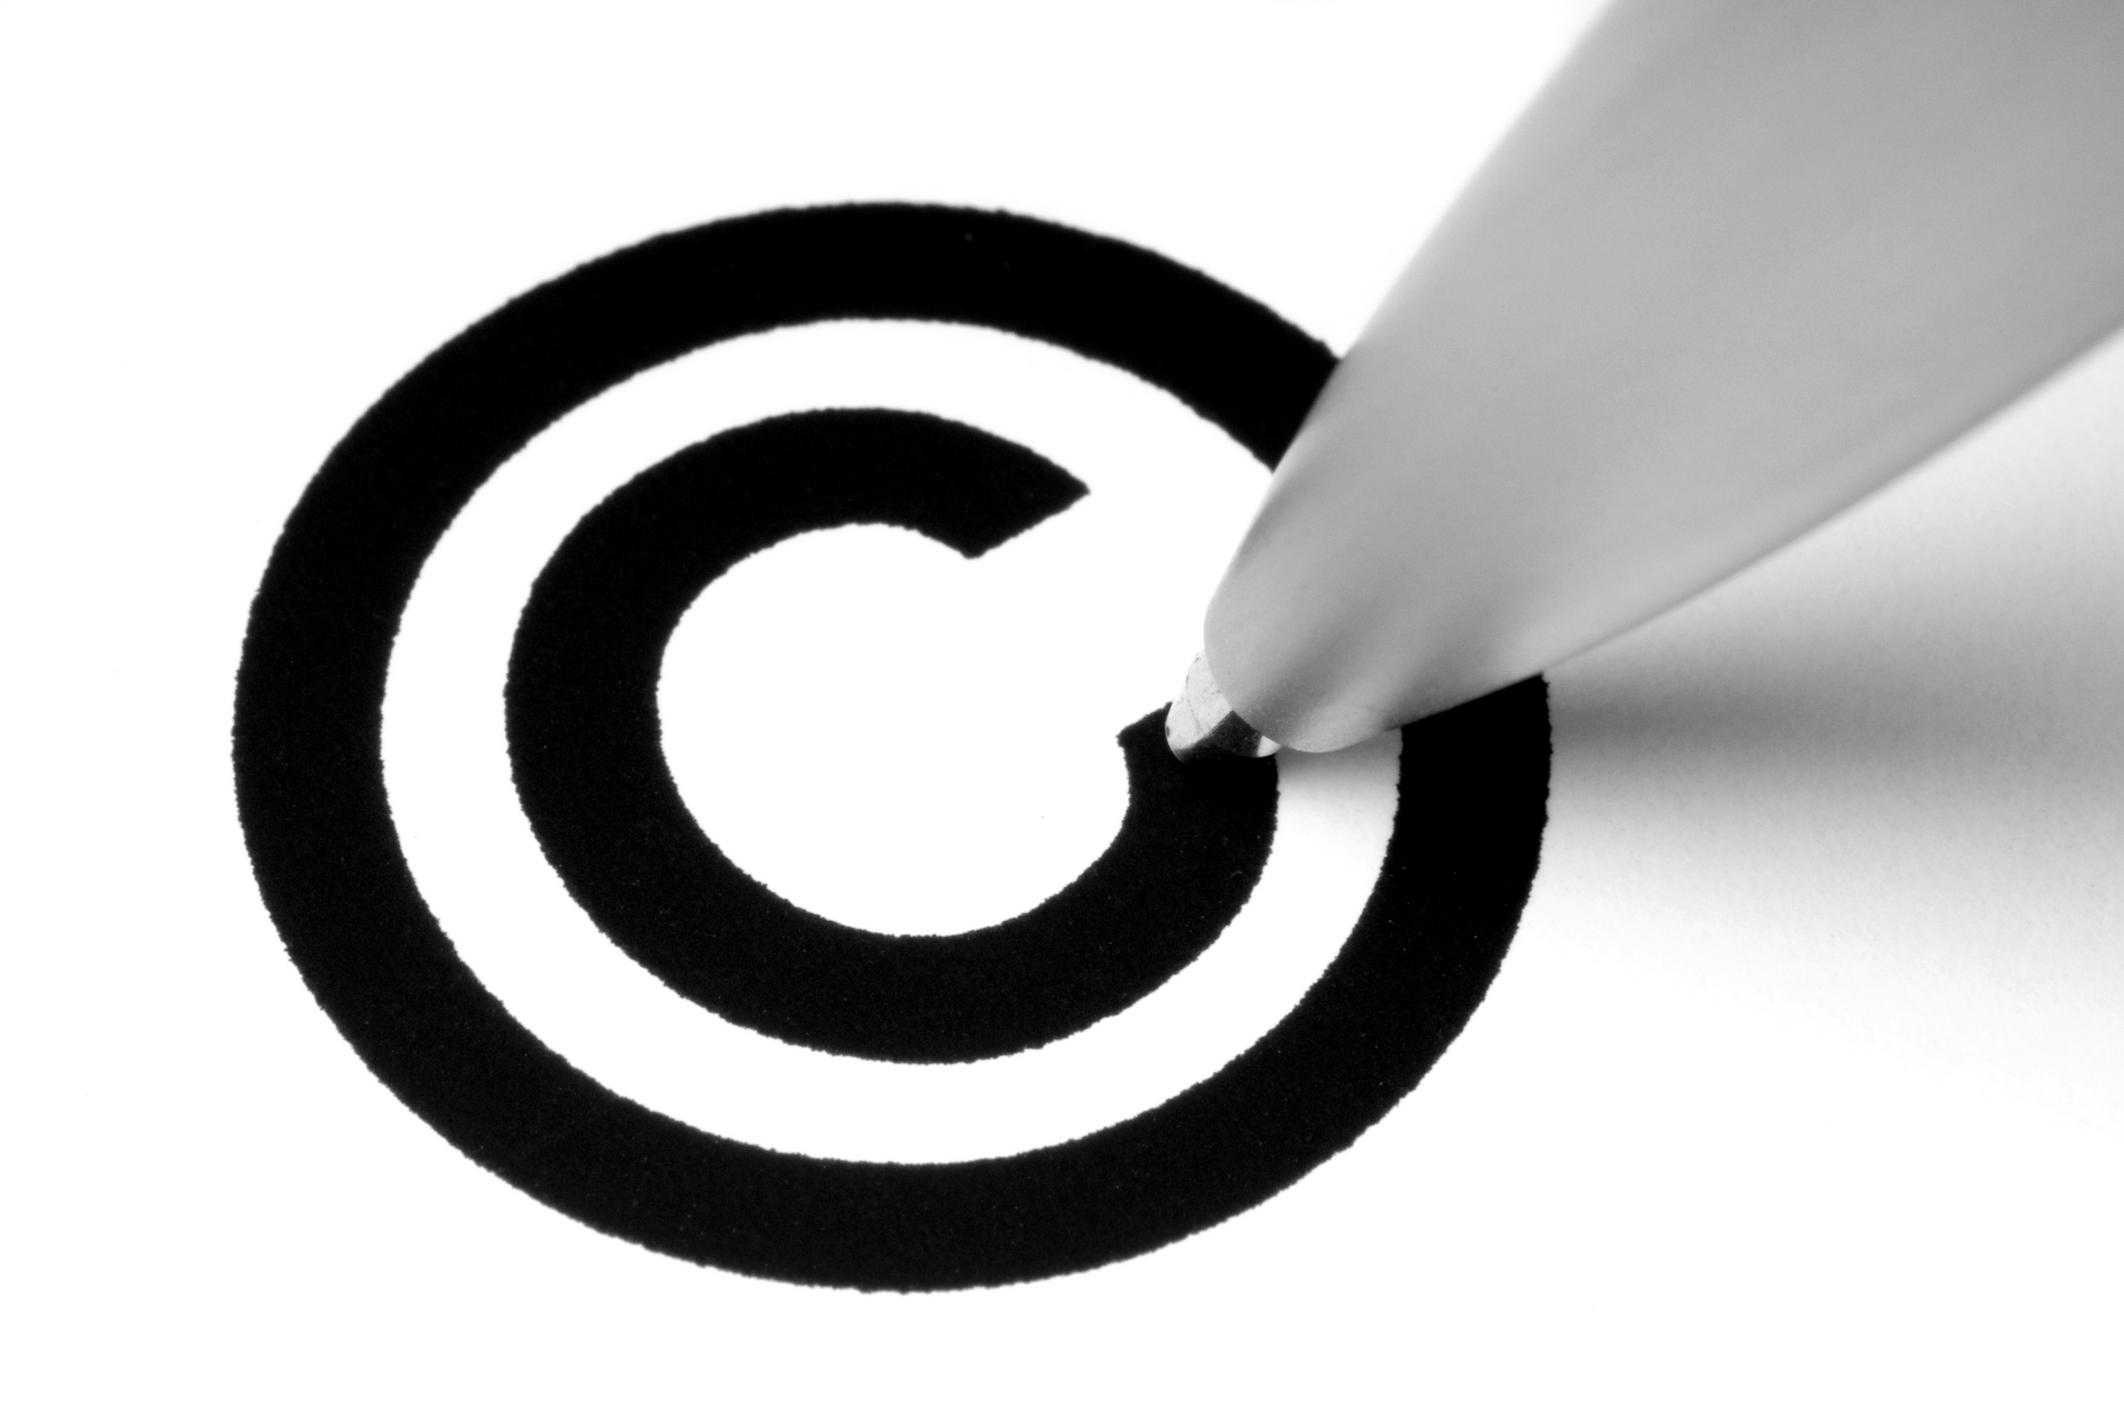 Mostrar un copyright completo